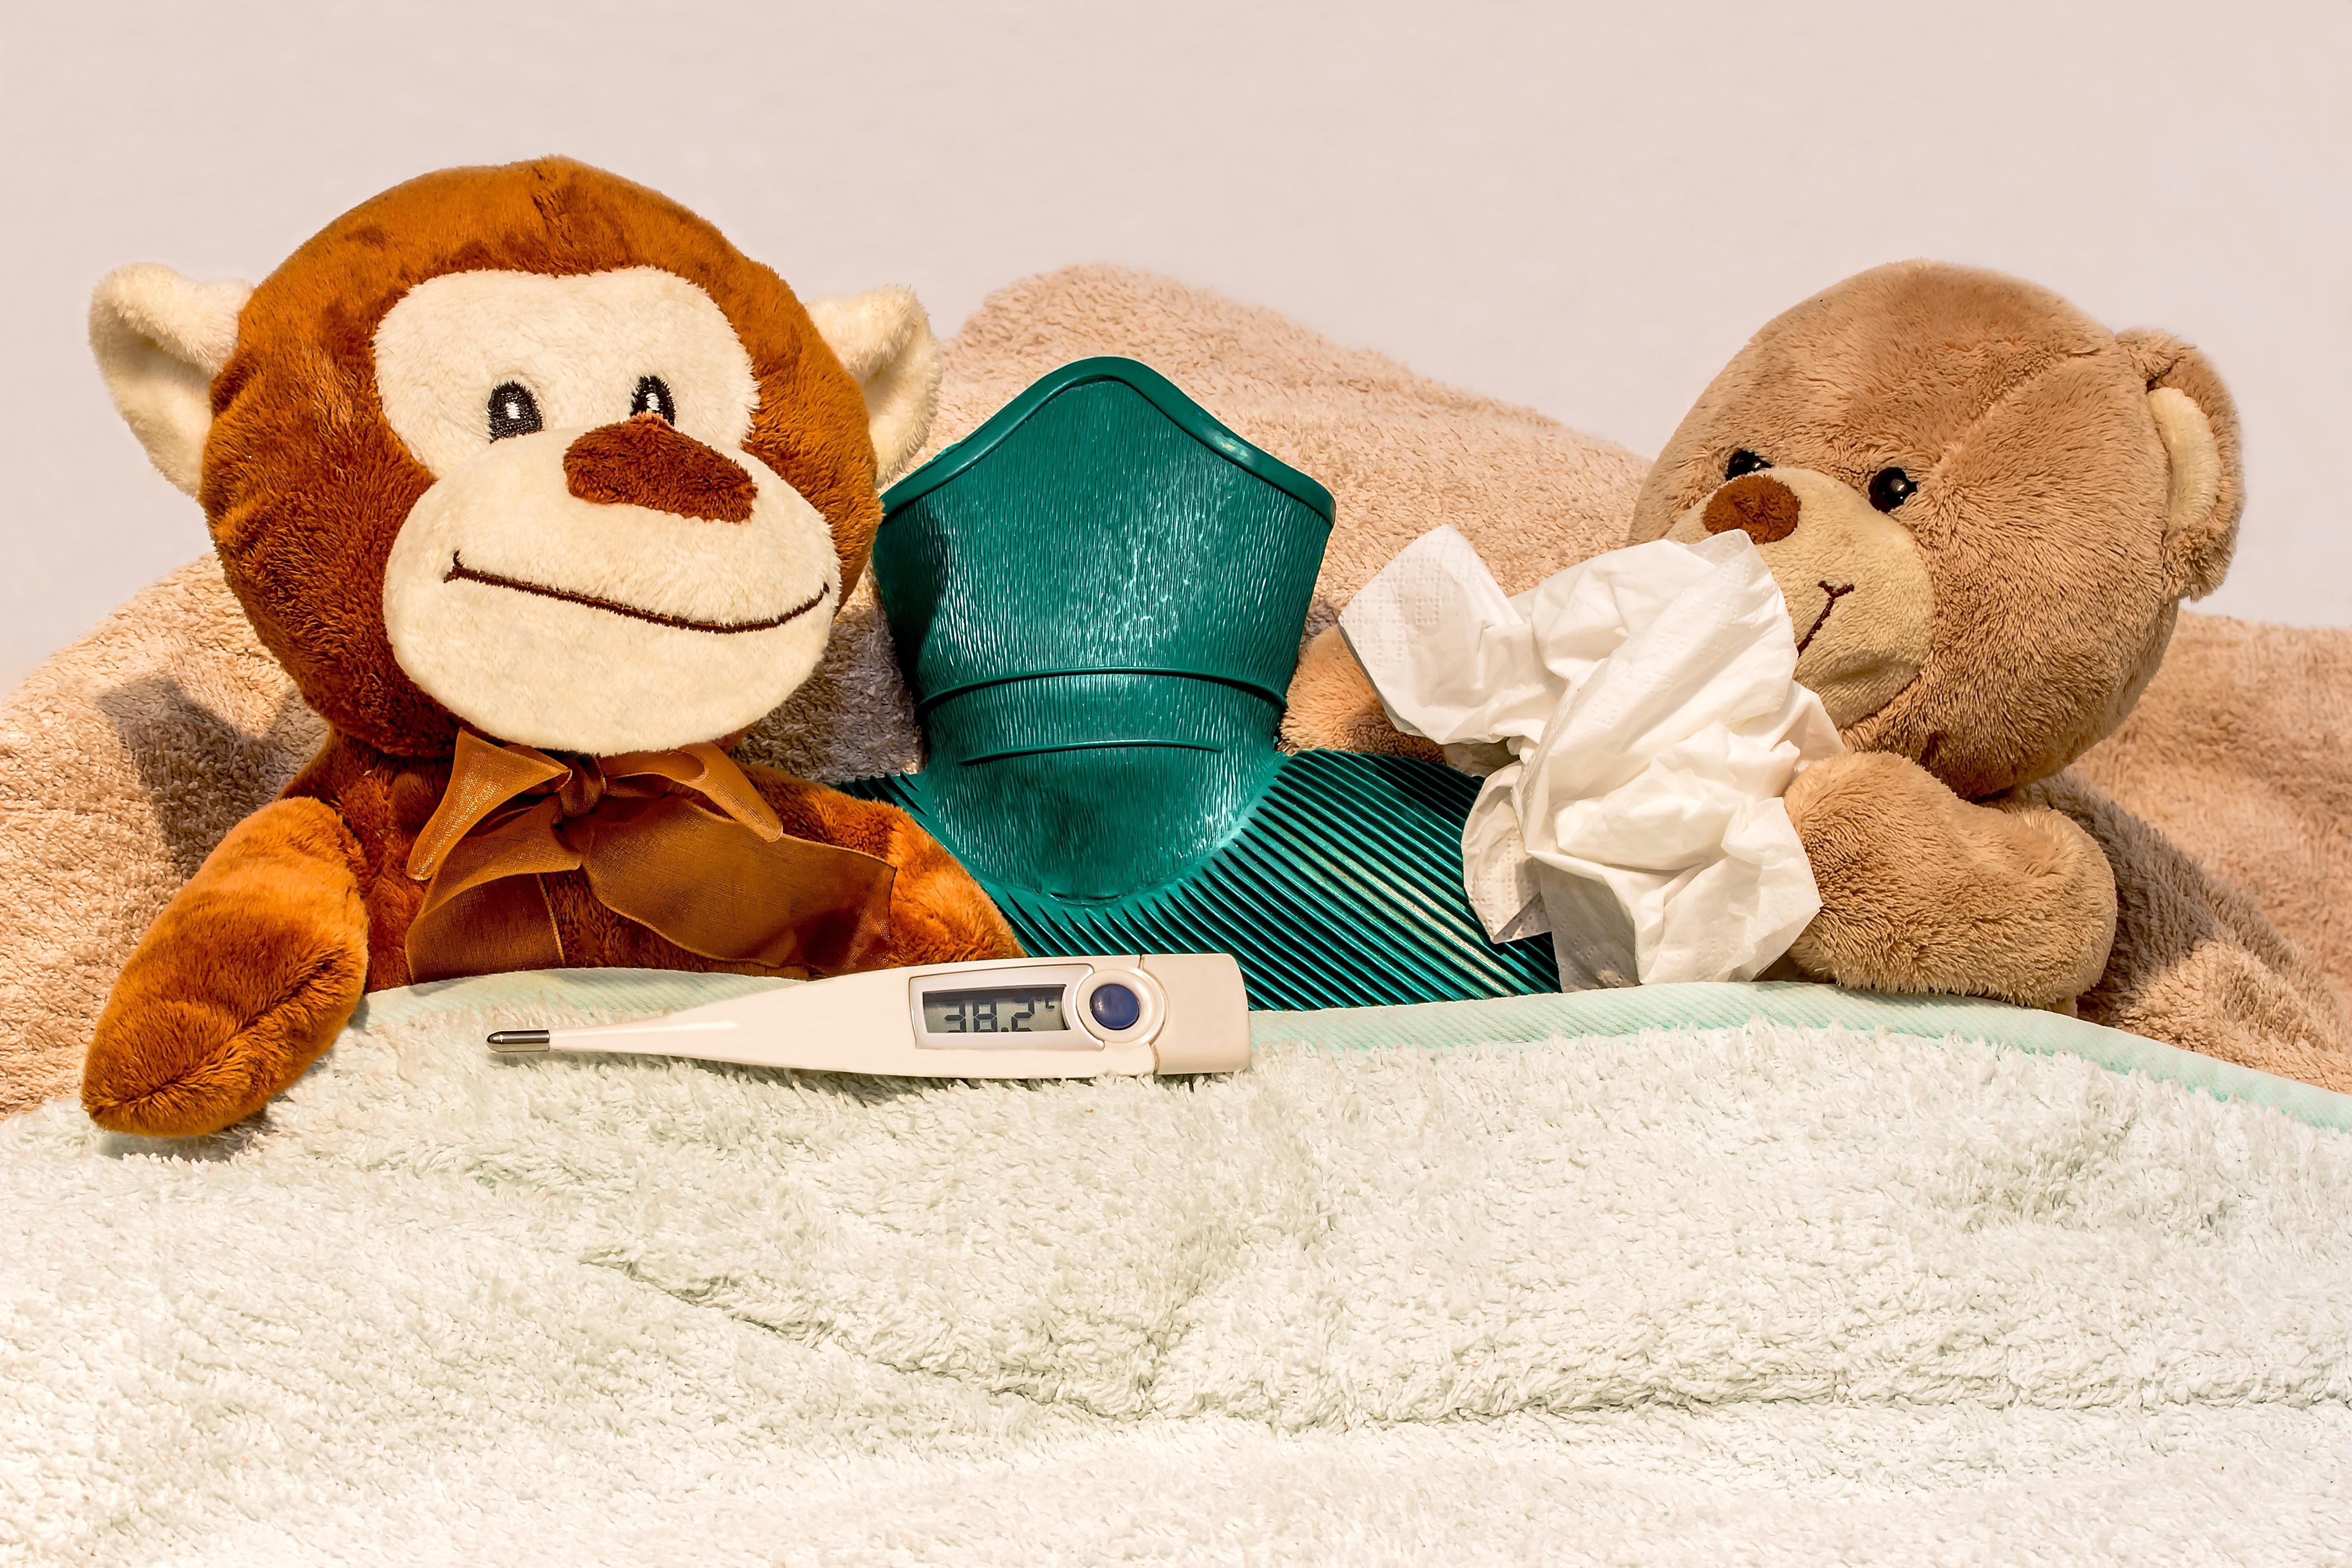 Gambar dingin beristirahat mainan beruang teddy tekstil gambar dingin beristirahat mainan beruang teddy tekstil selimut mewah diberkatilah anda mencium memulihkan boneka beruang saputangan thecheapjerseys Image collections